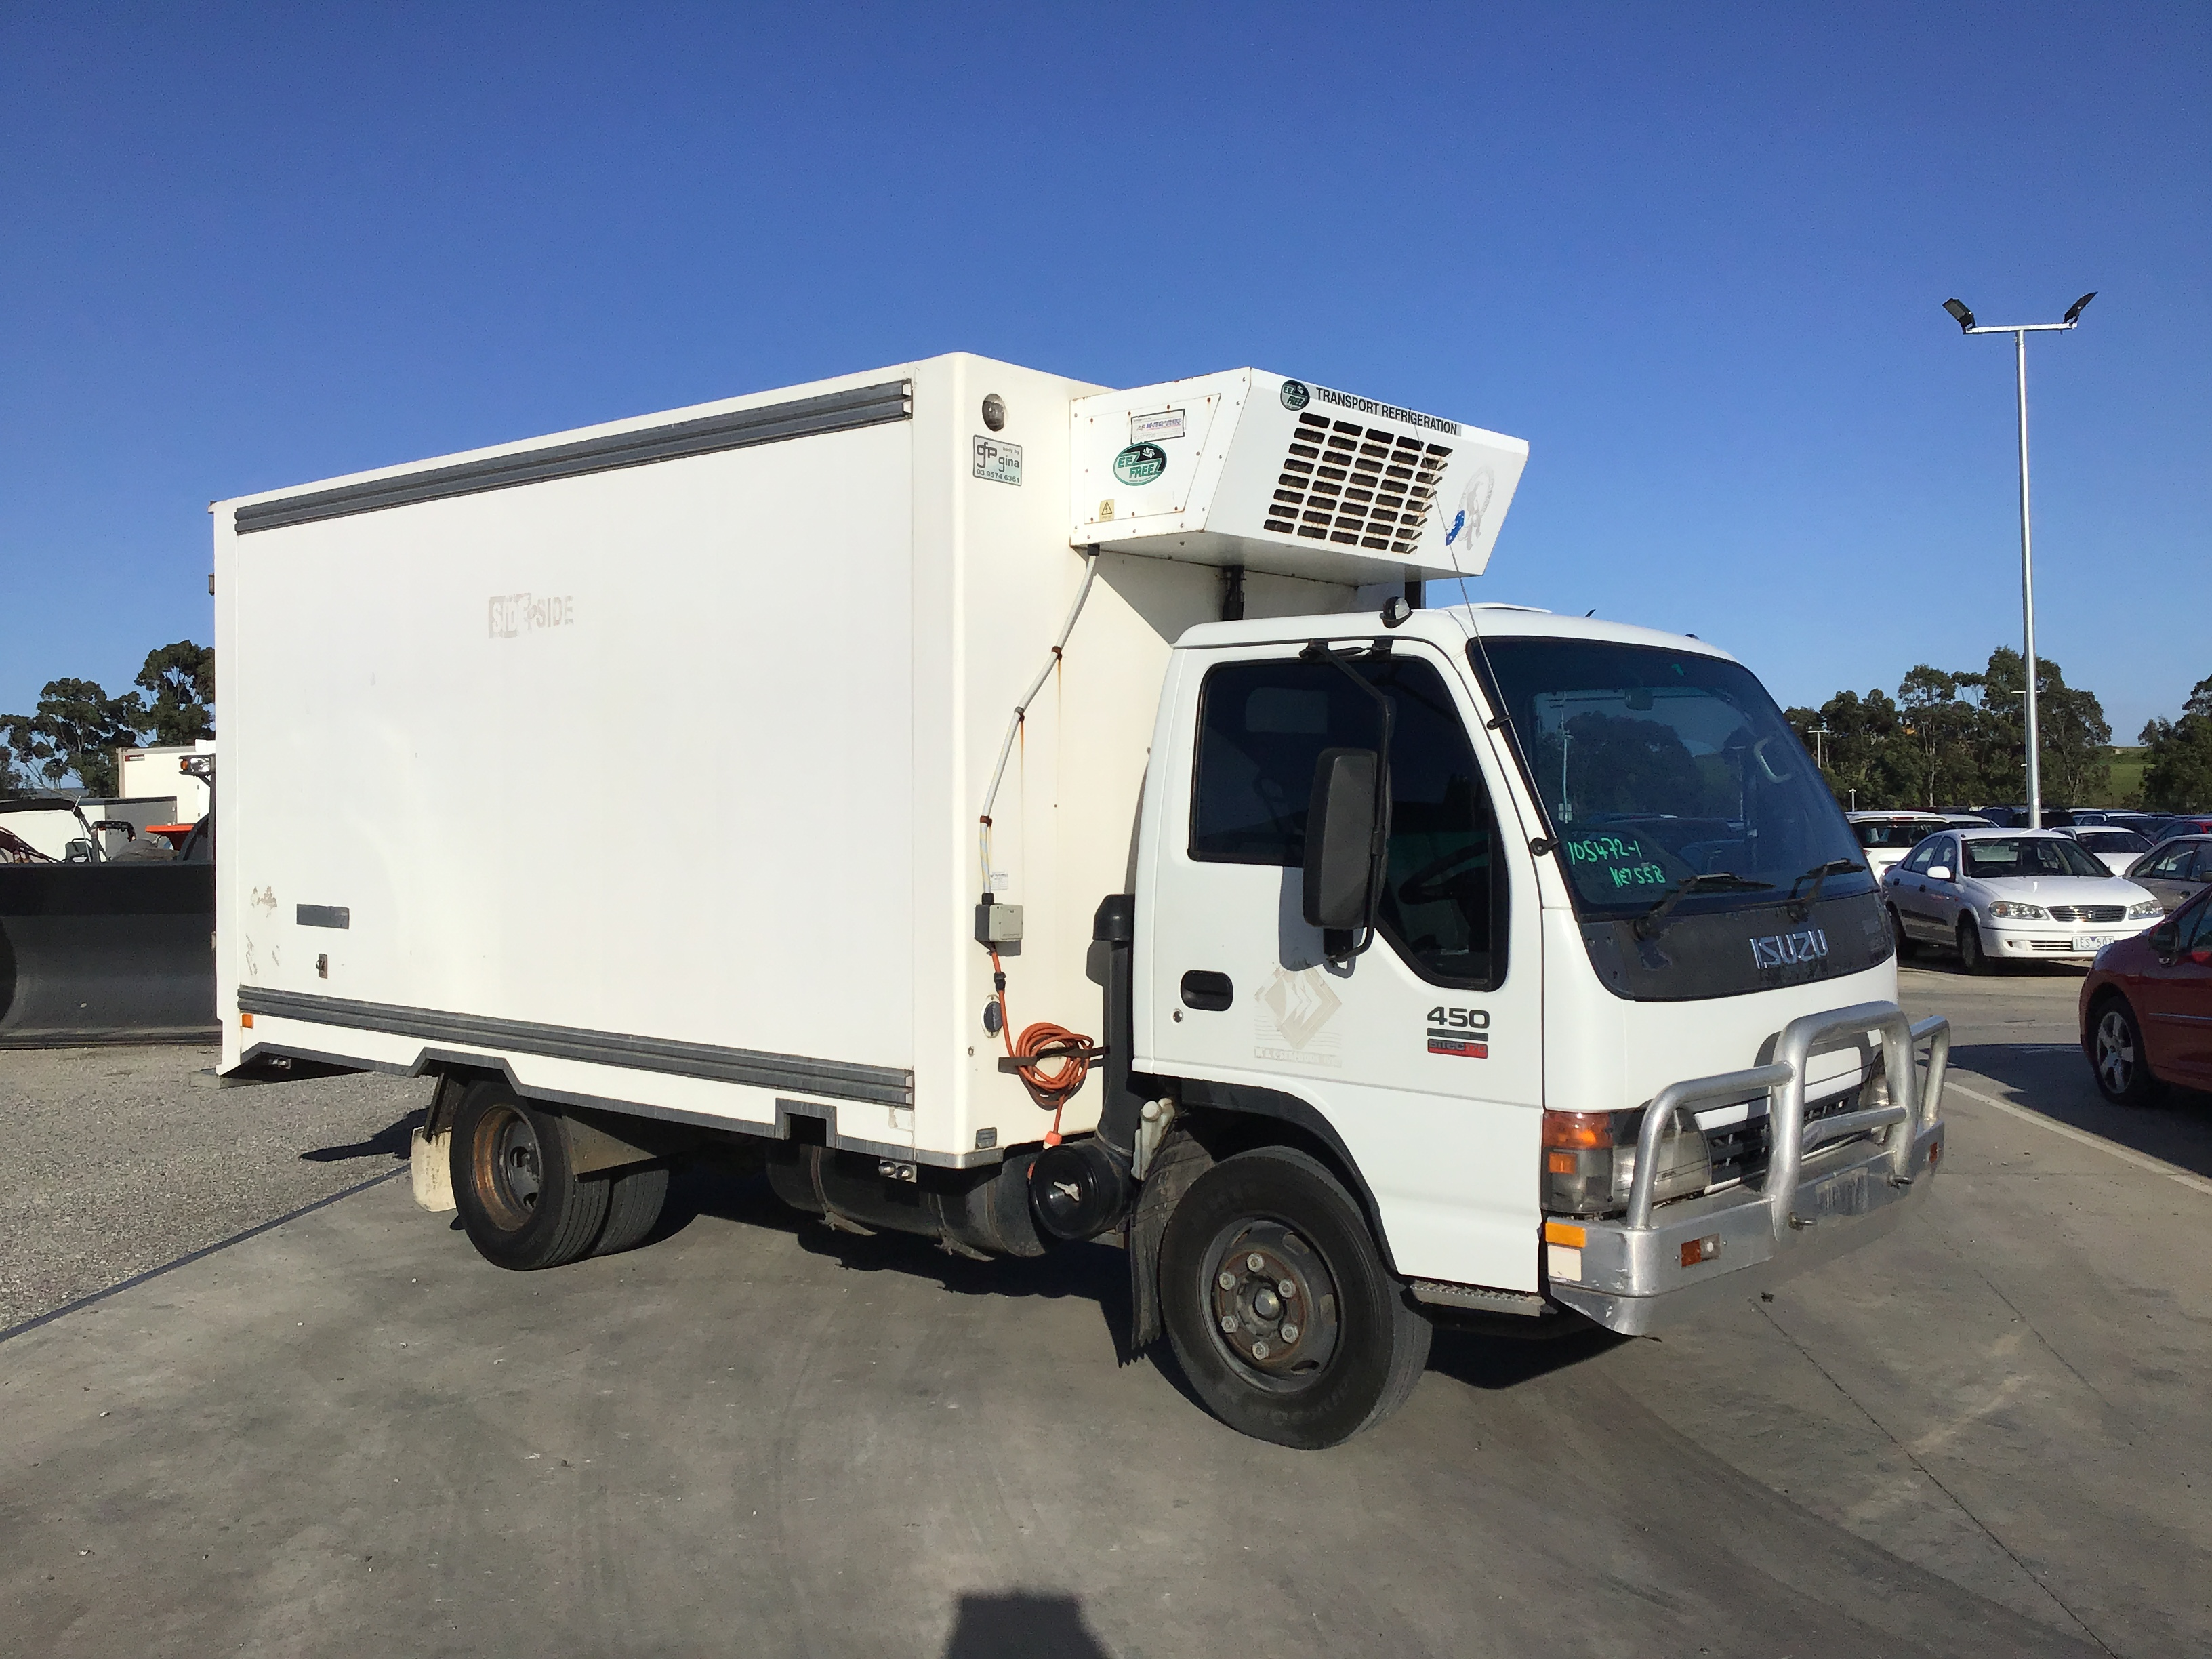 2005 Isuzu NQR 450 Medium 4 x 2 Refrigerated Body Truck